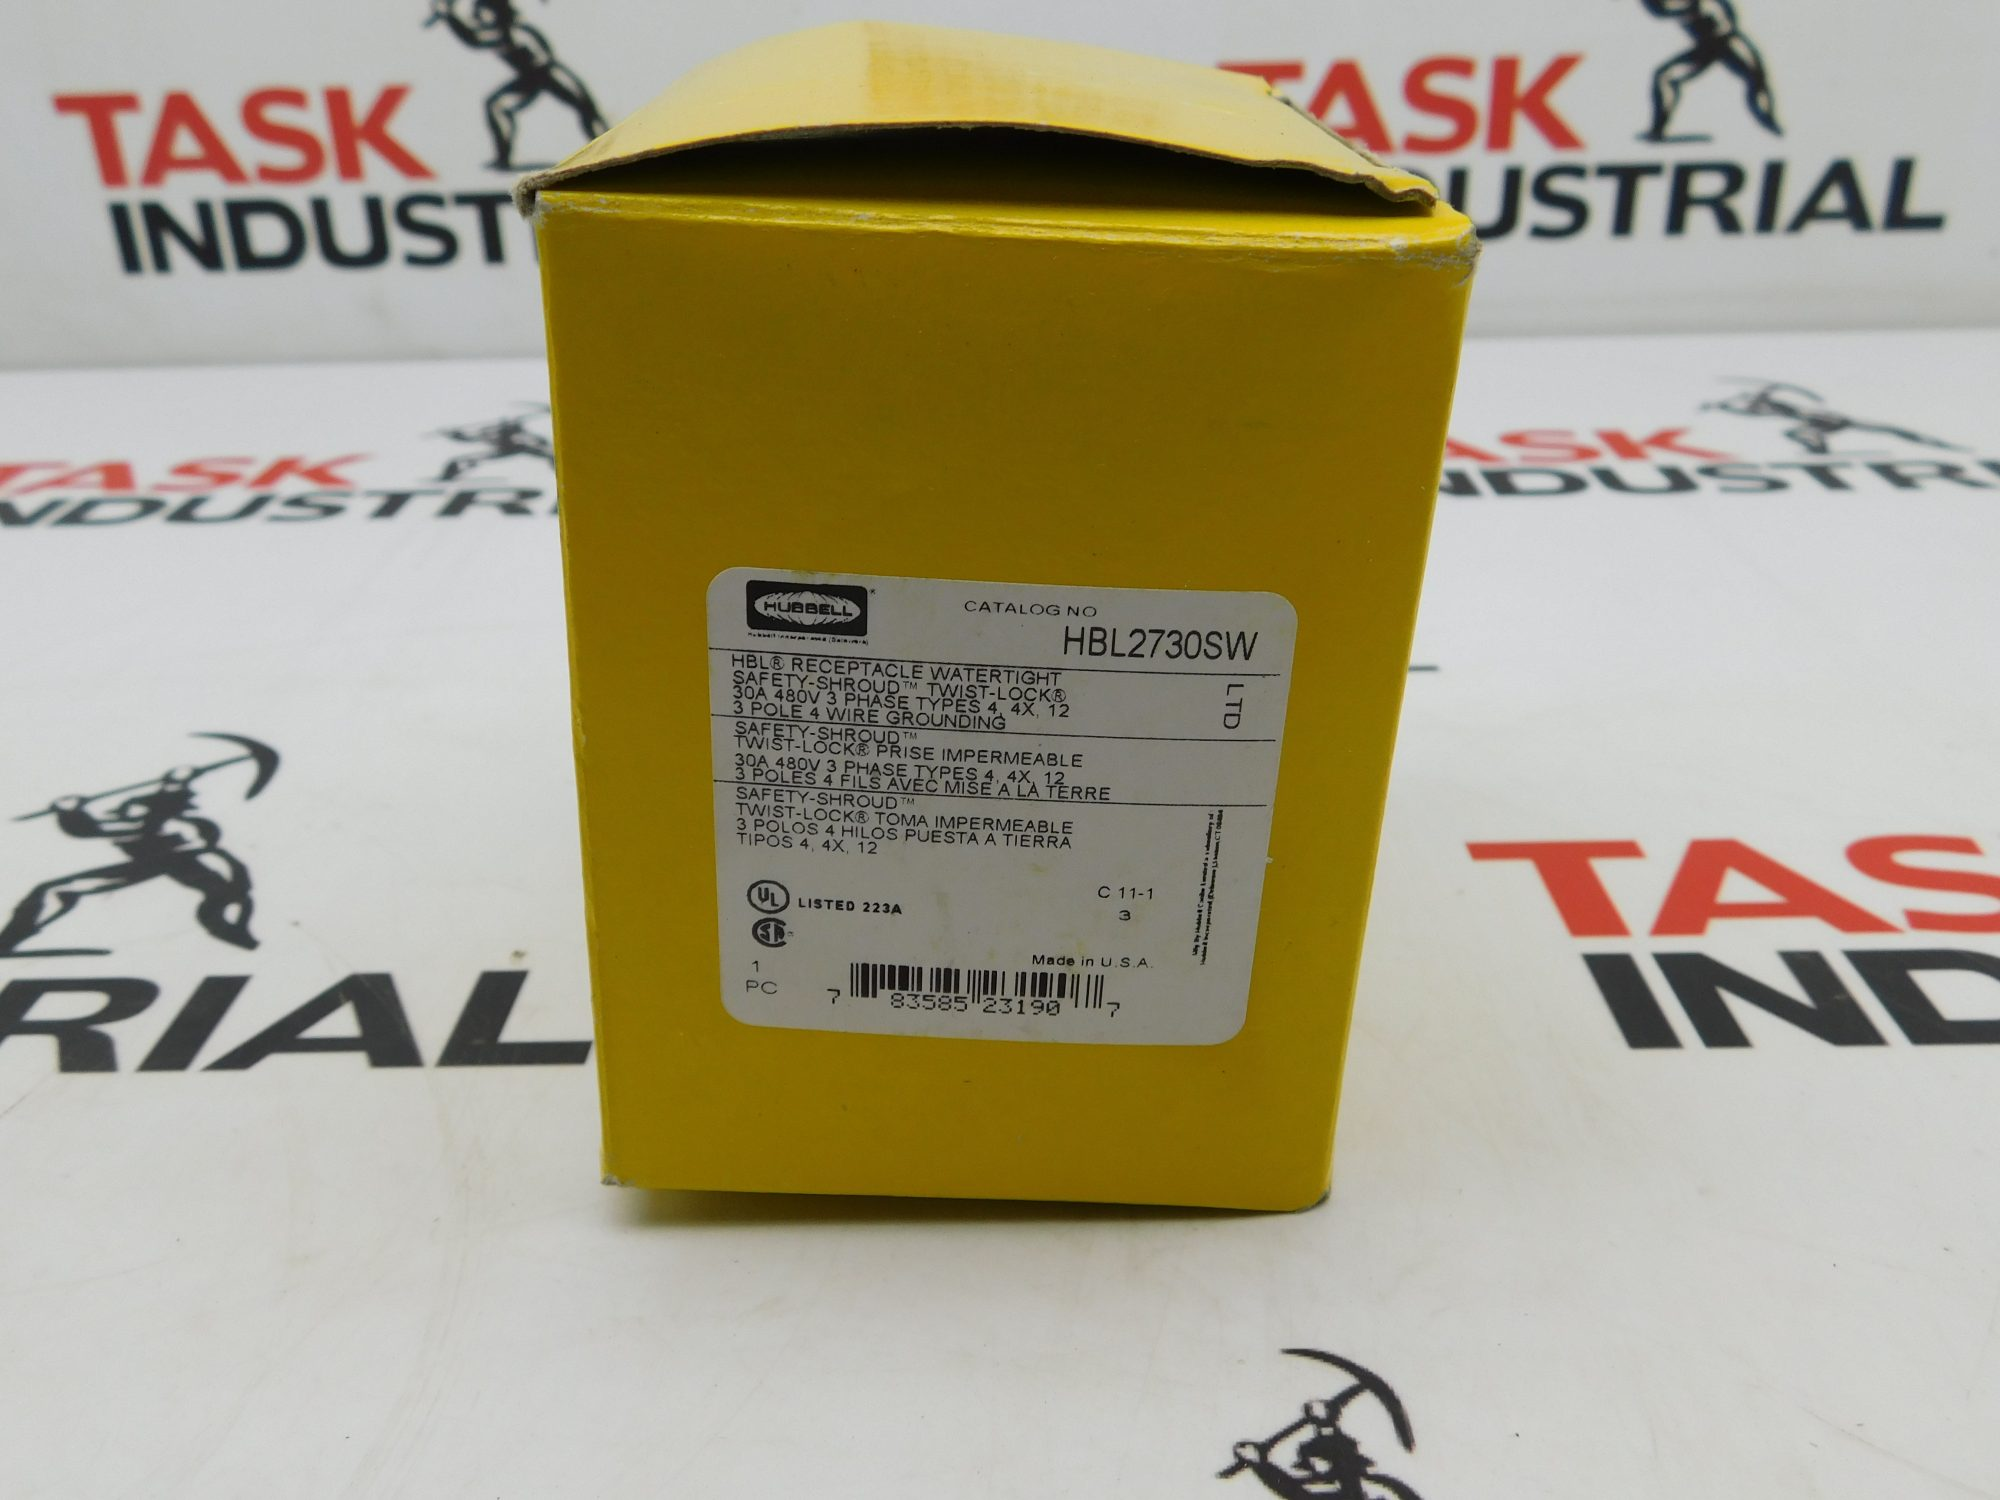 Hubbell CAT No. HBL2730SW Receptacle 30A 480V 3P 4W